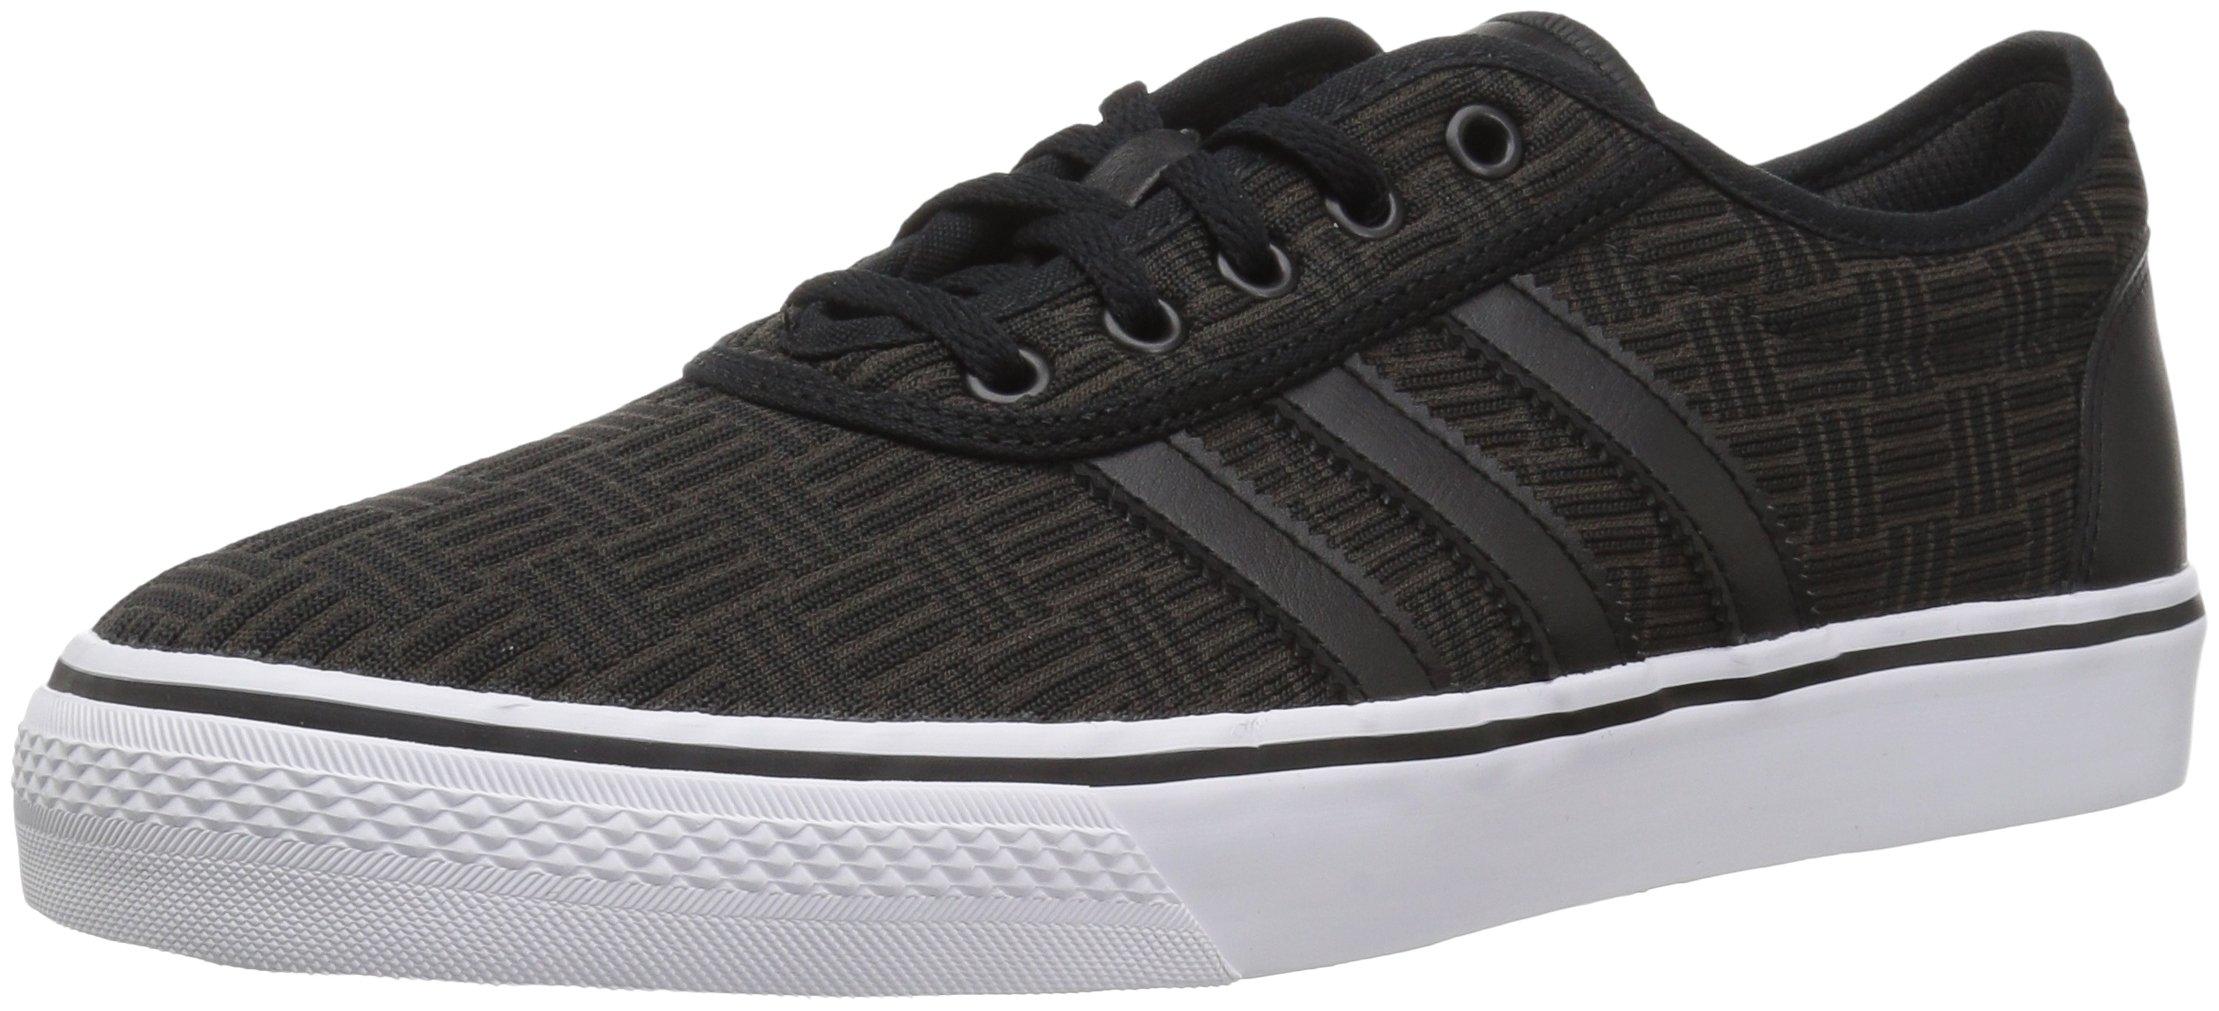 premium selection 988c1 1fe76 Galleon - Adidas Originals Adi-Ease Skate Shoe, DGH Solid Grey, Core Black, FTWR  White, 13.5 M US